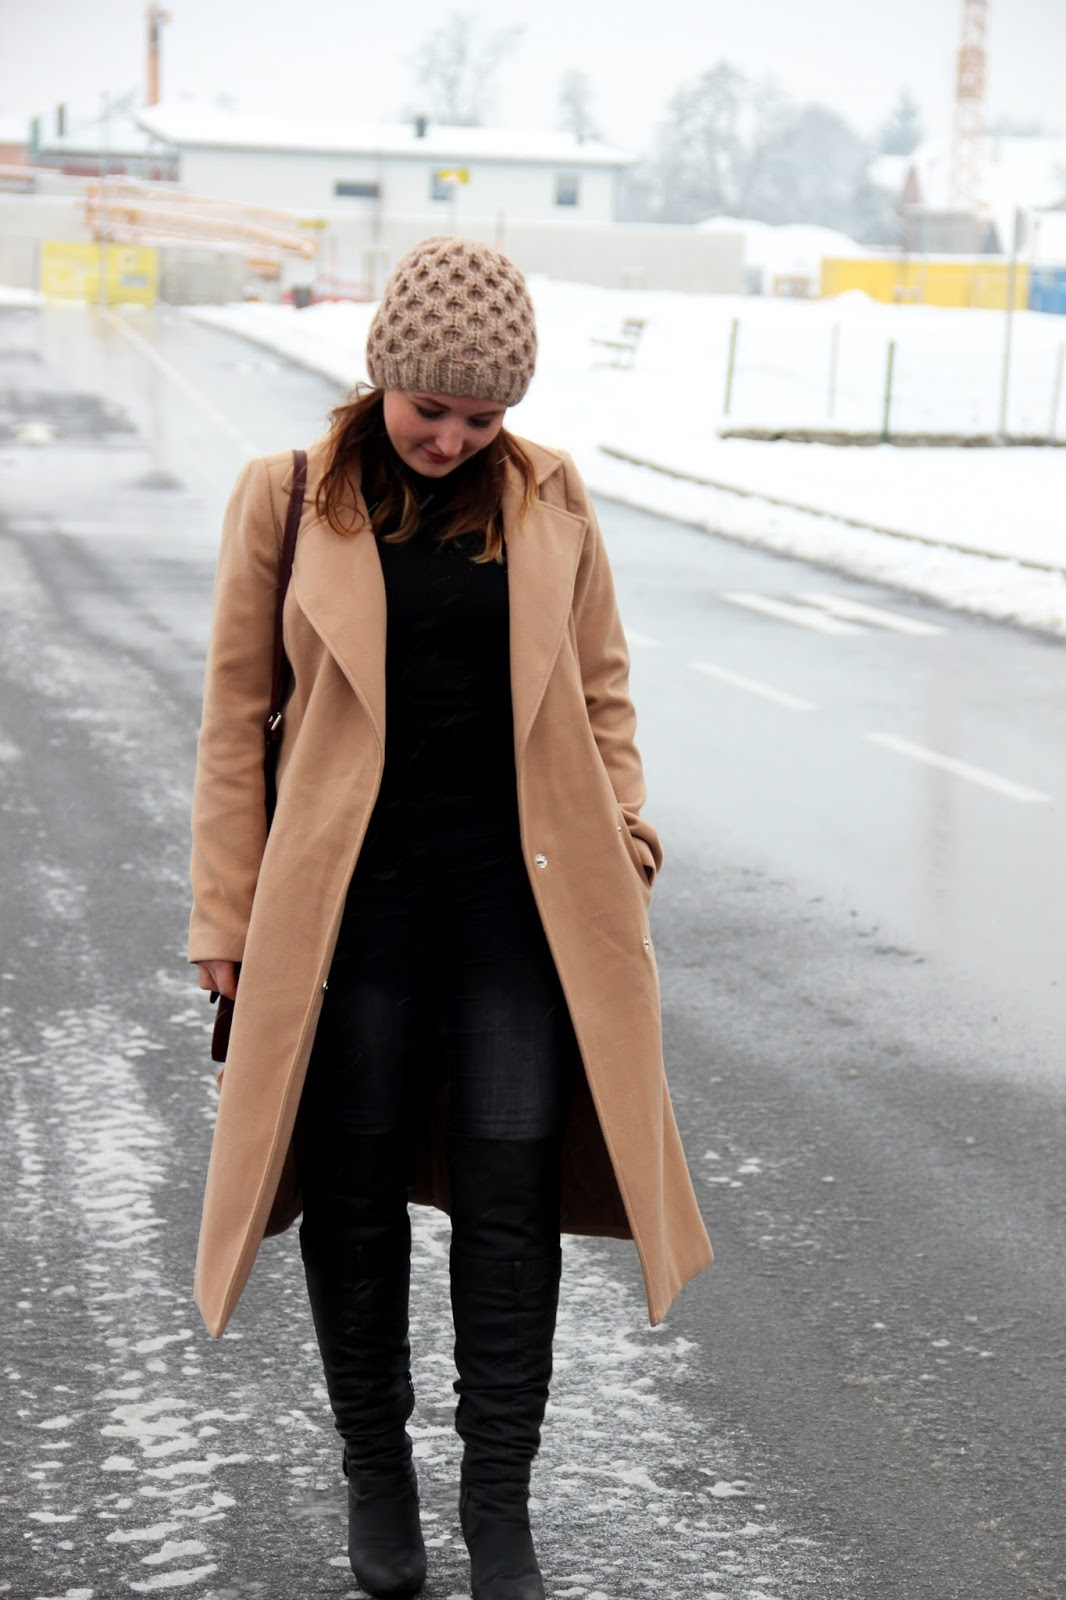 Hellbrauner mantel